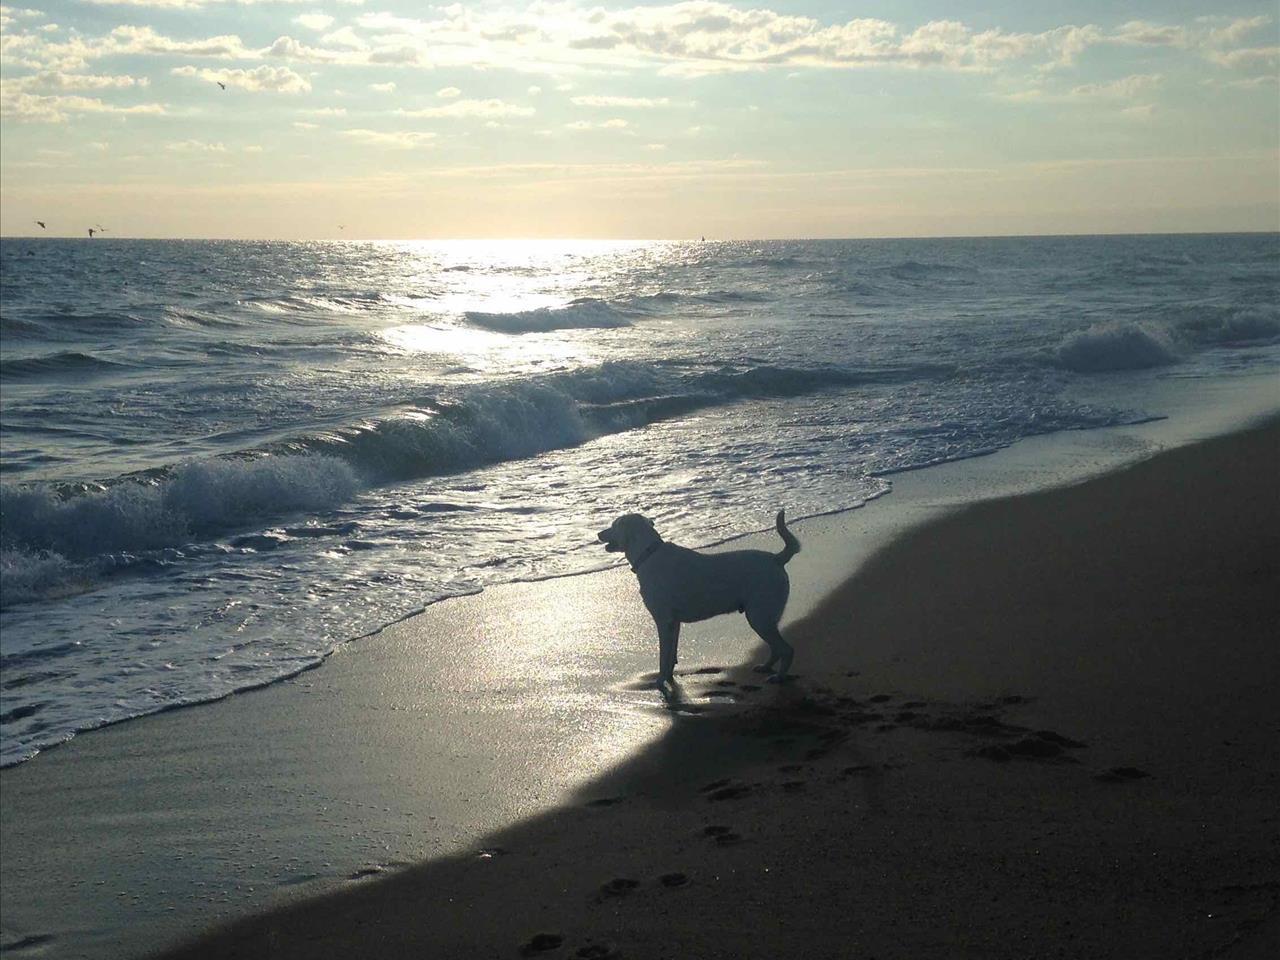 October 2015 Stay - KD13 - Surfin Gypsy (Formerly Pelican Cay), Bari Nixon